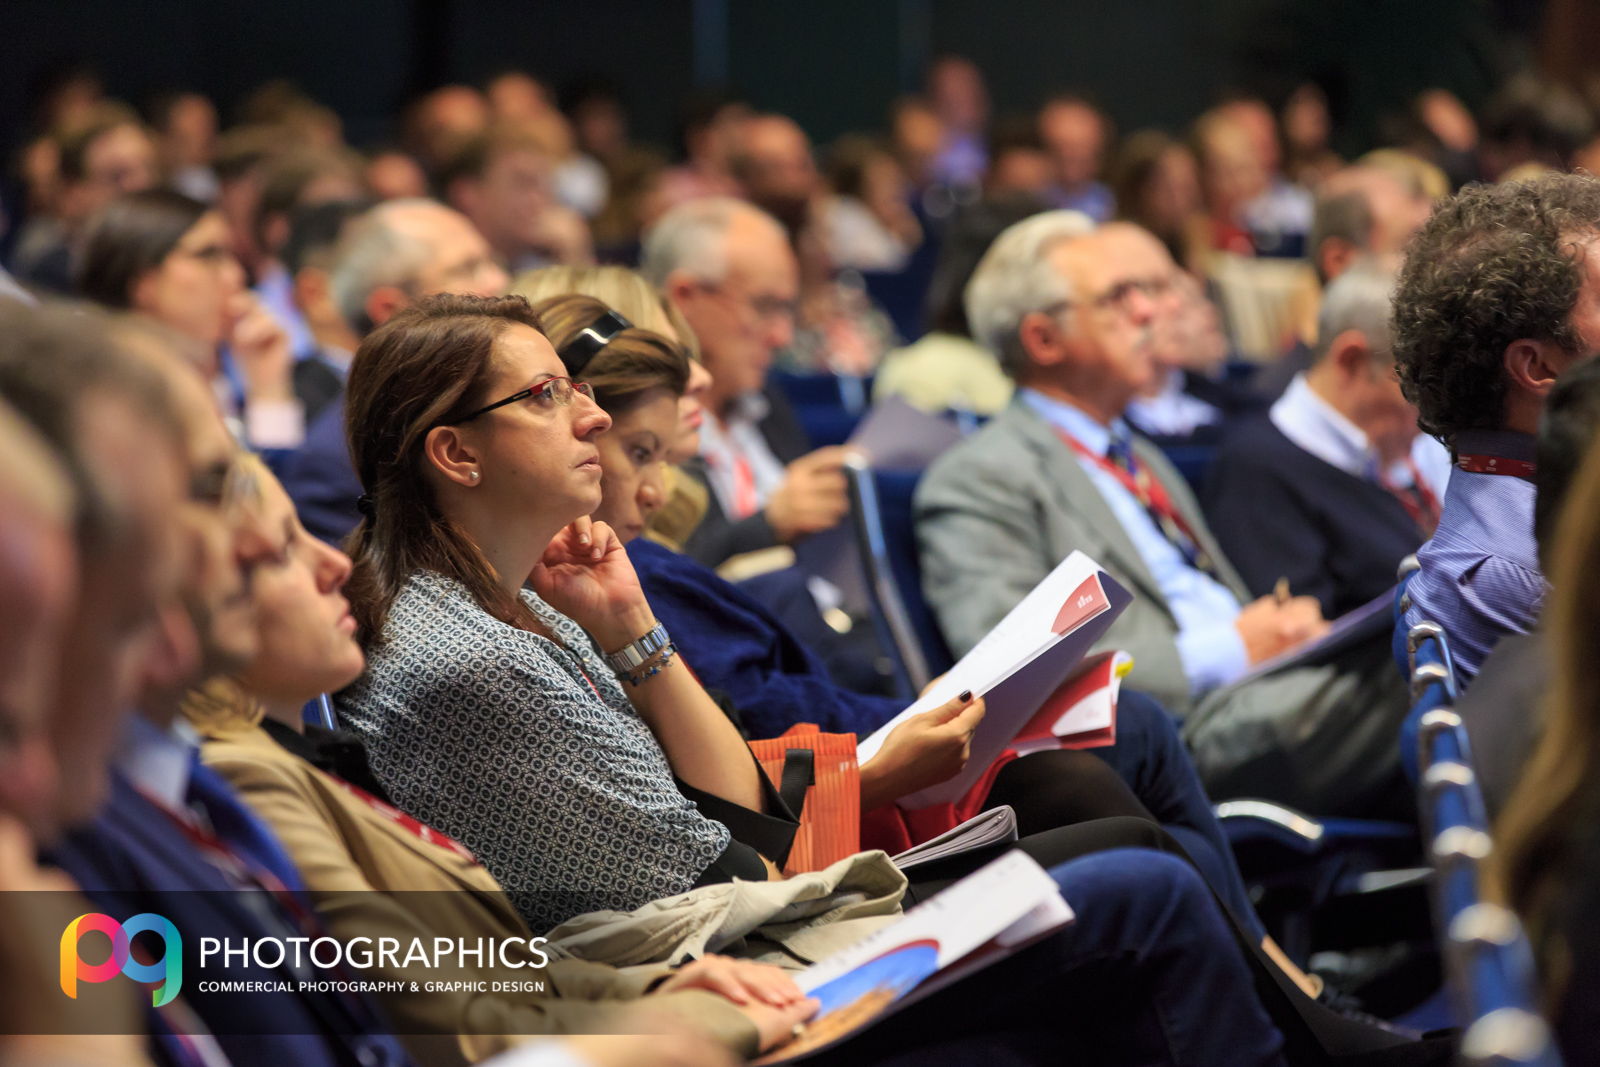 ESCR-2018-conference-event-photography-UK-glasgow-edinburgh-10.jpg